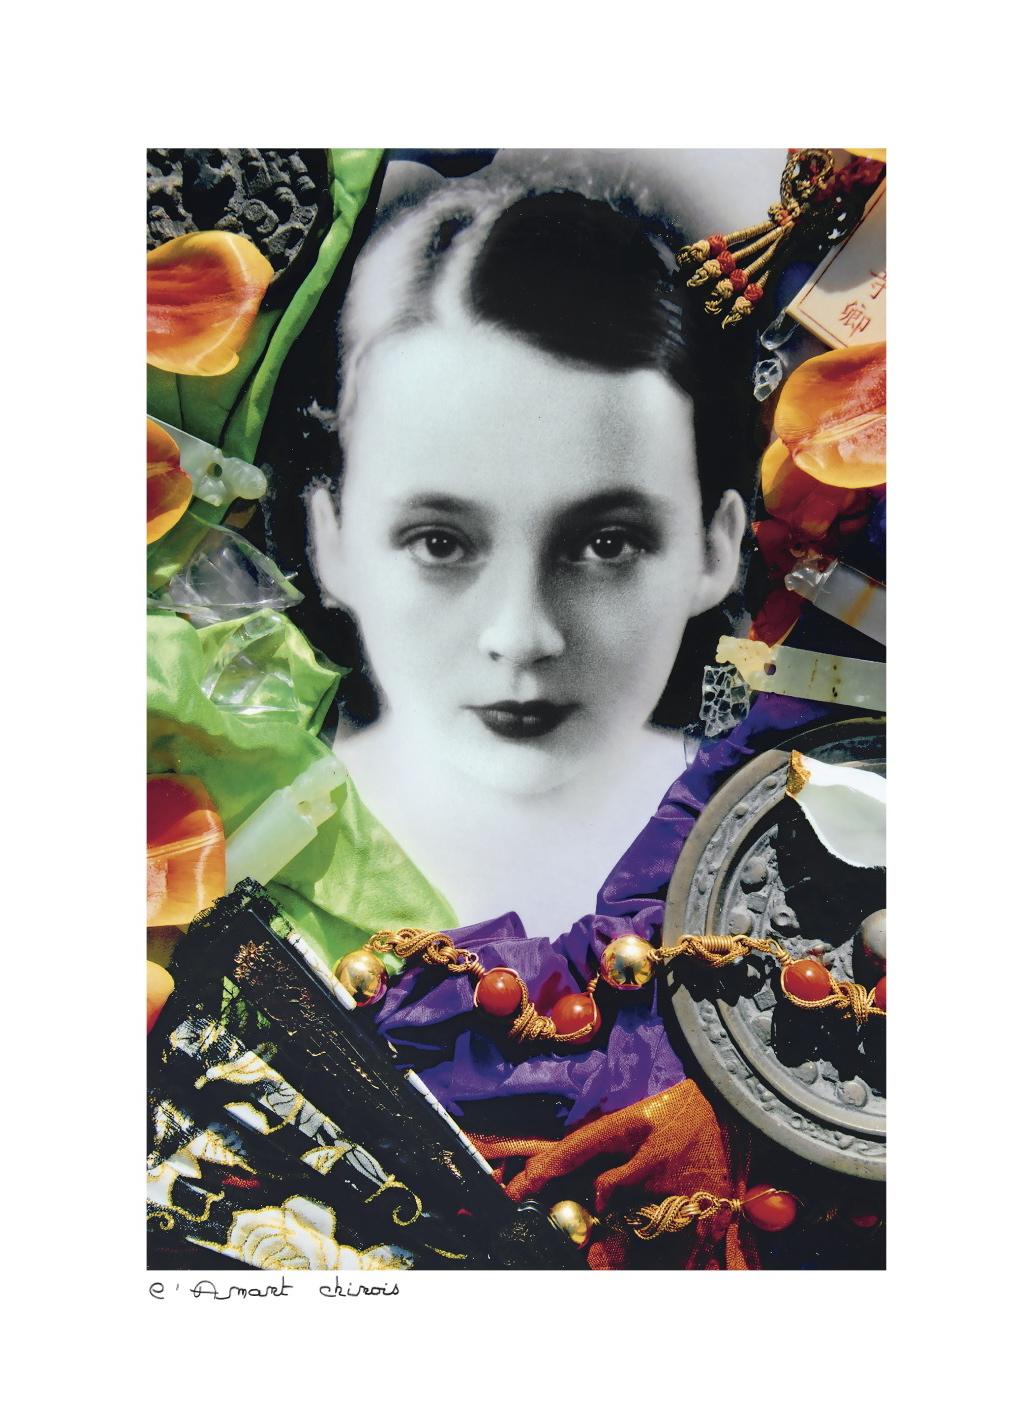 Christine Spengler - Hommage à Marguerite Duras - L'Amant chinois